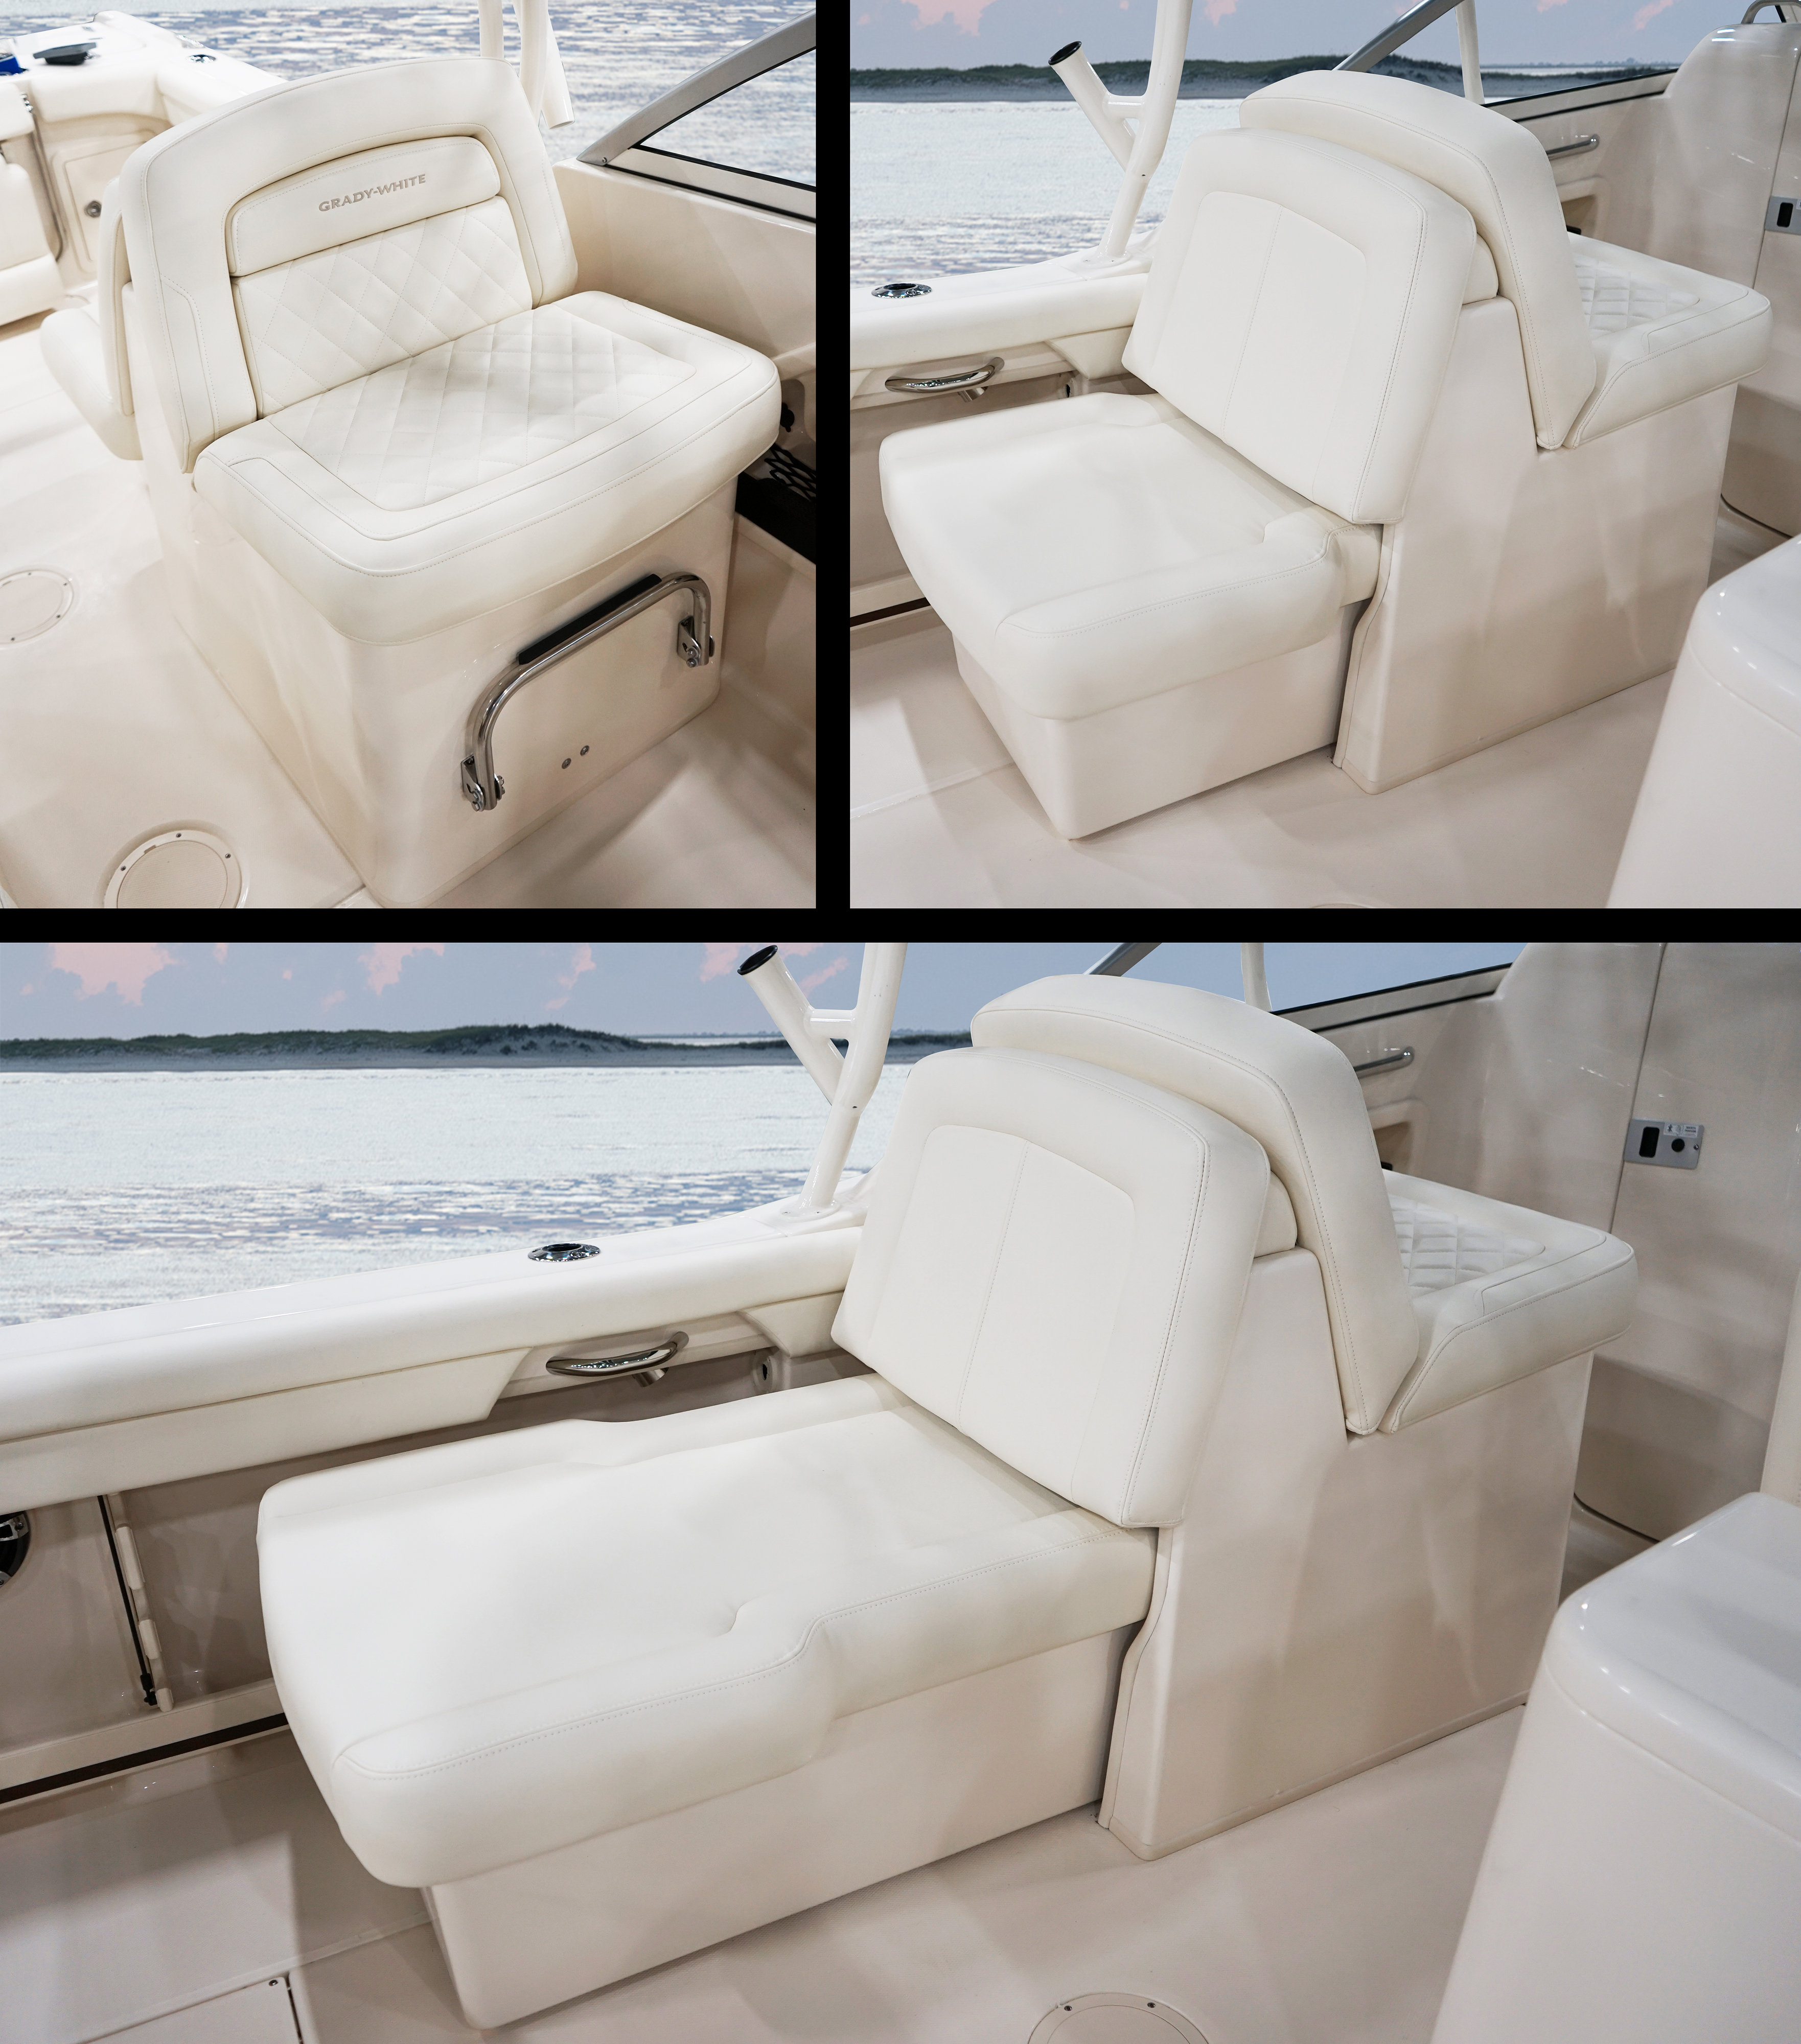 Grady-White Freedom 255 25-foot dual console deluxe companion seat